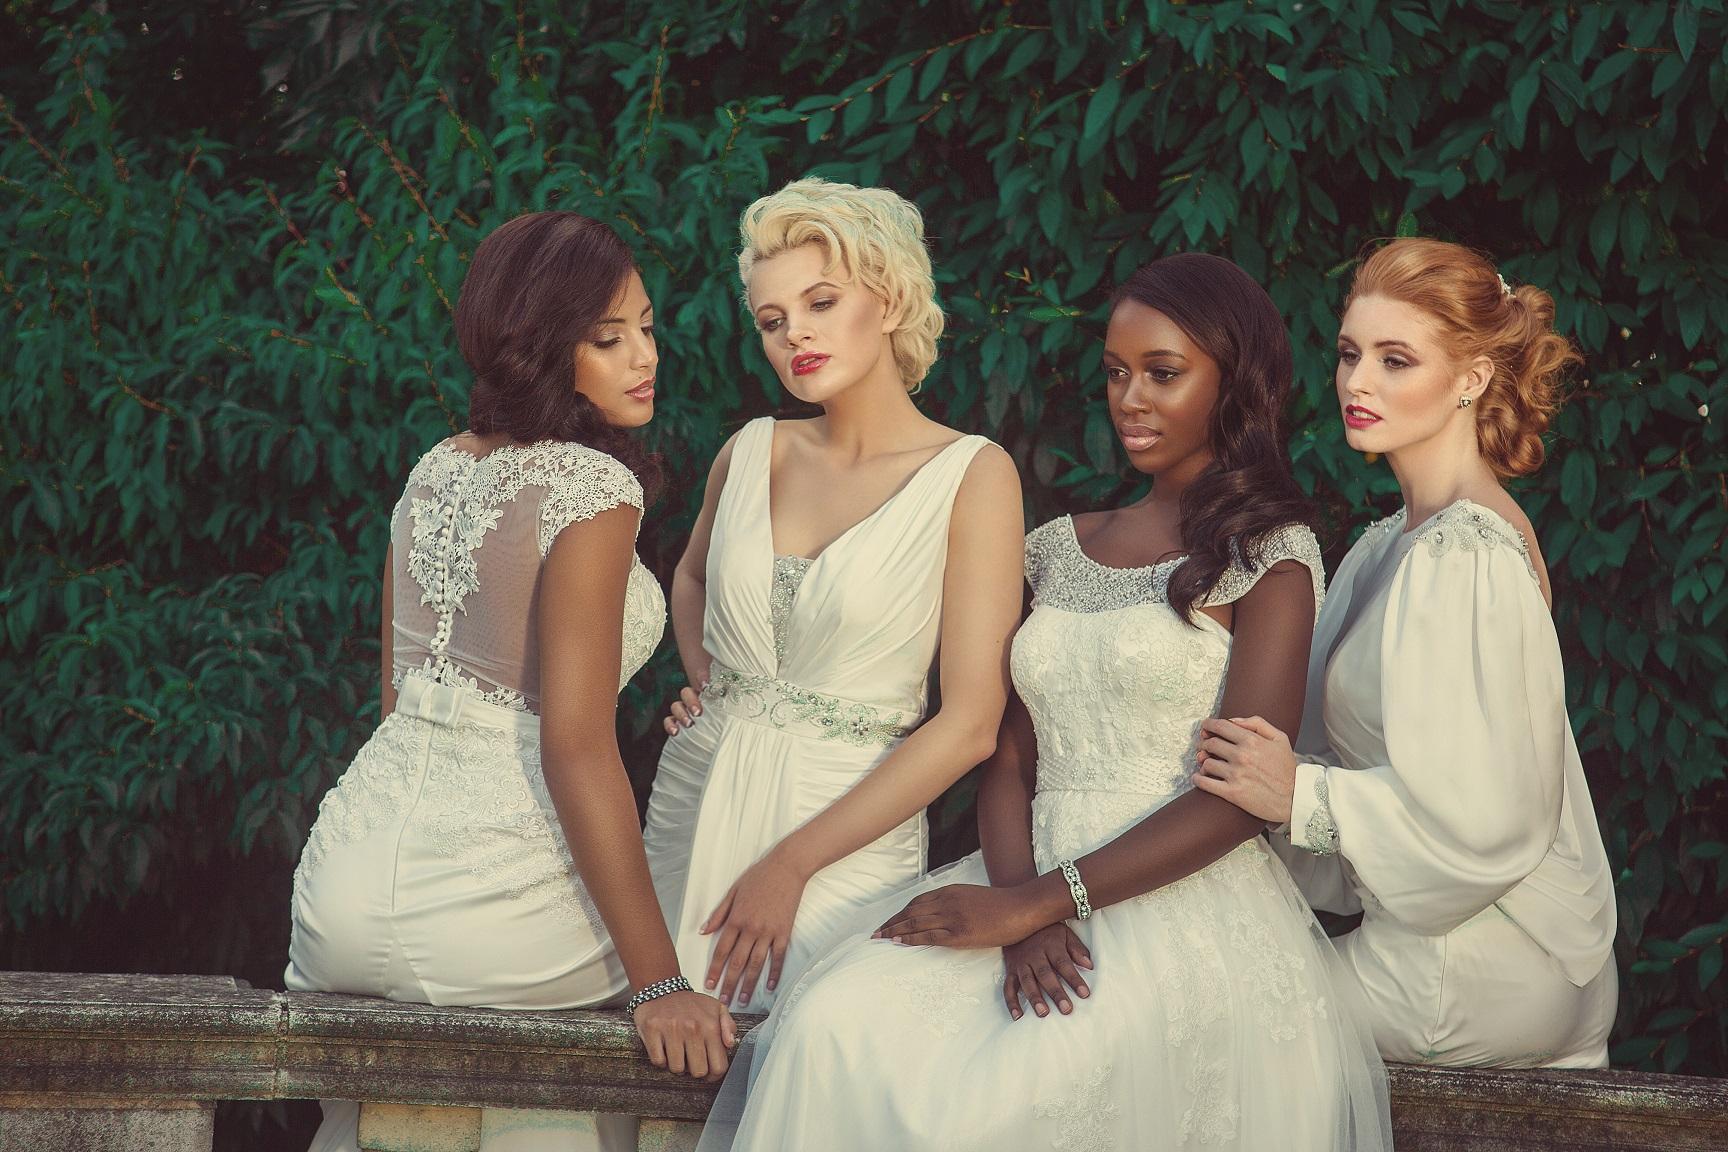 Bridal collection launch in milton keynes estilo moda bridal affordable luxury designer wedding dresses milton keynes london stunning lace satin ombrellifo Images